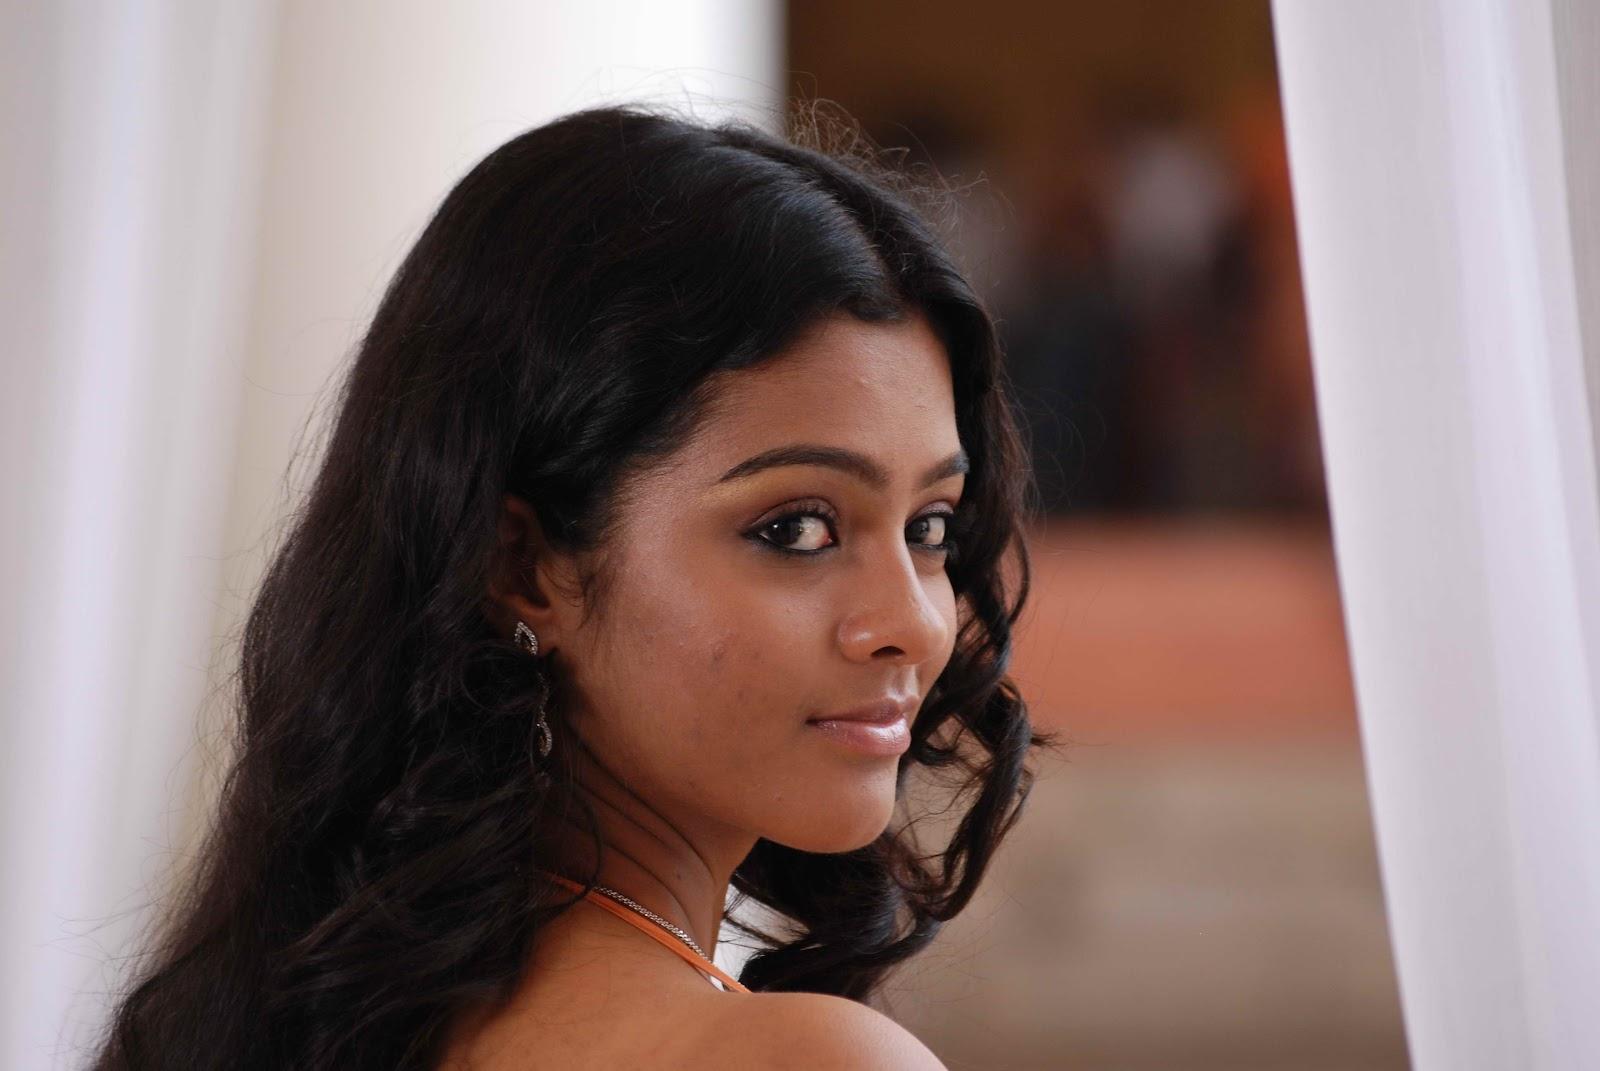 18 Vayasu Tamil Mp3 Download 18 Vayasu Video Free